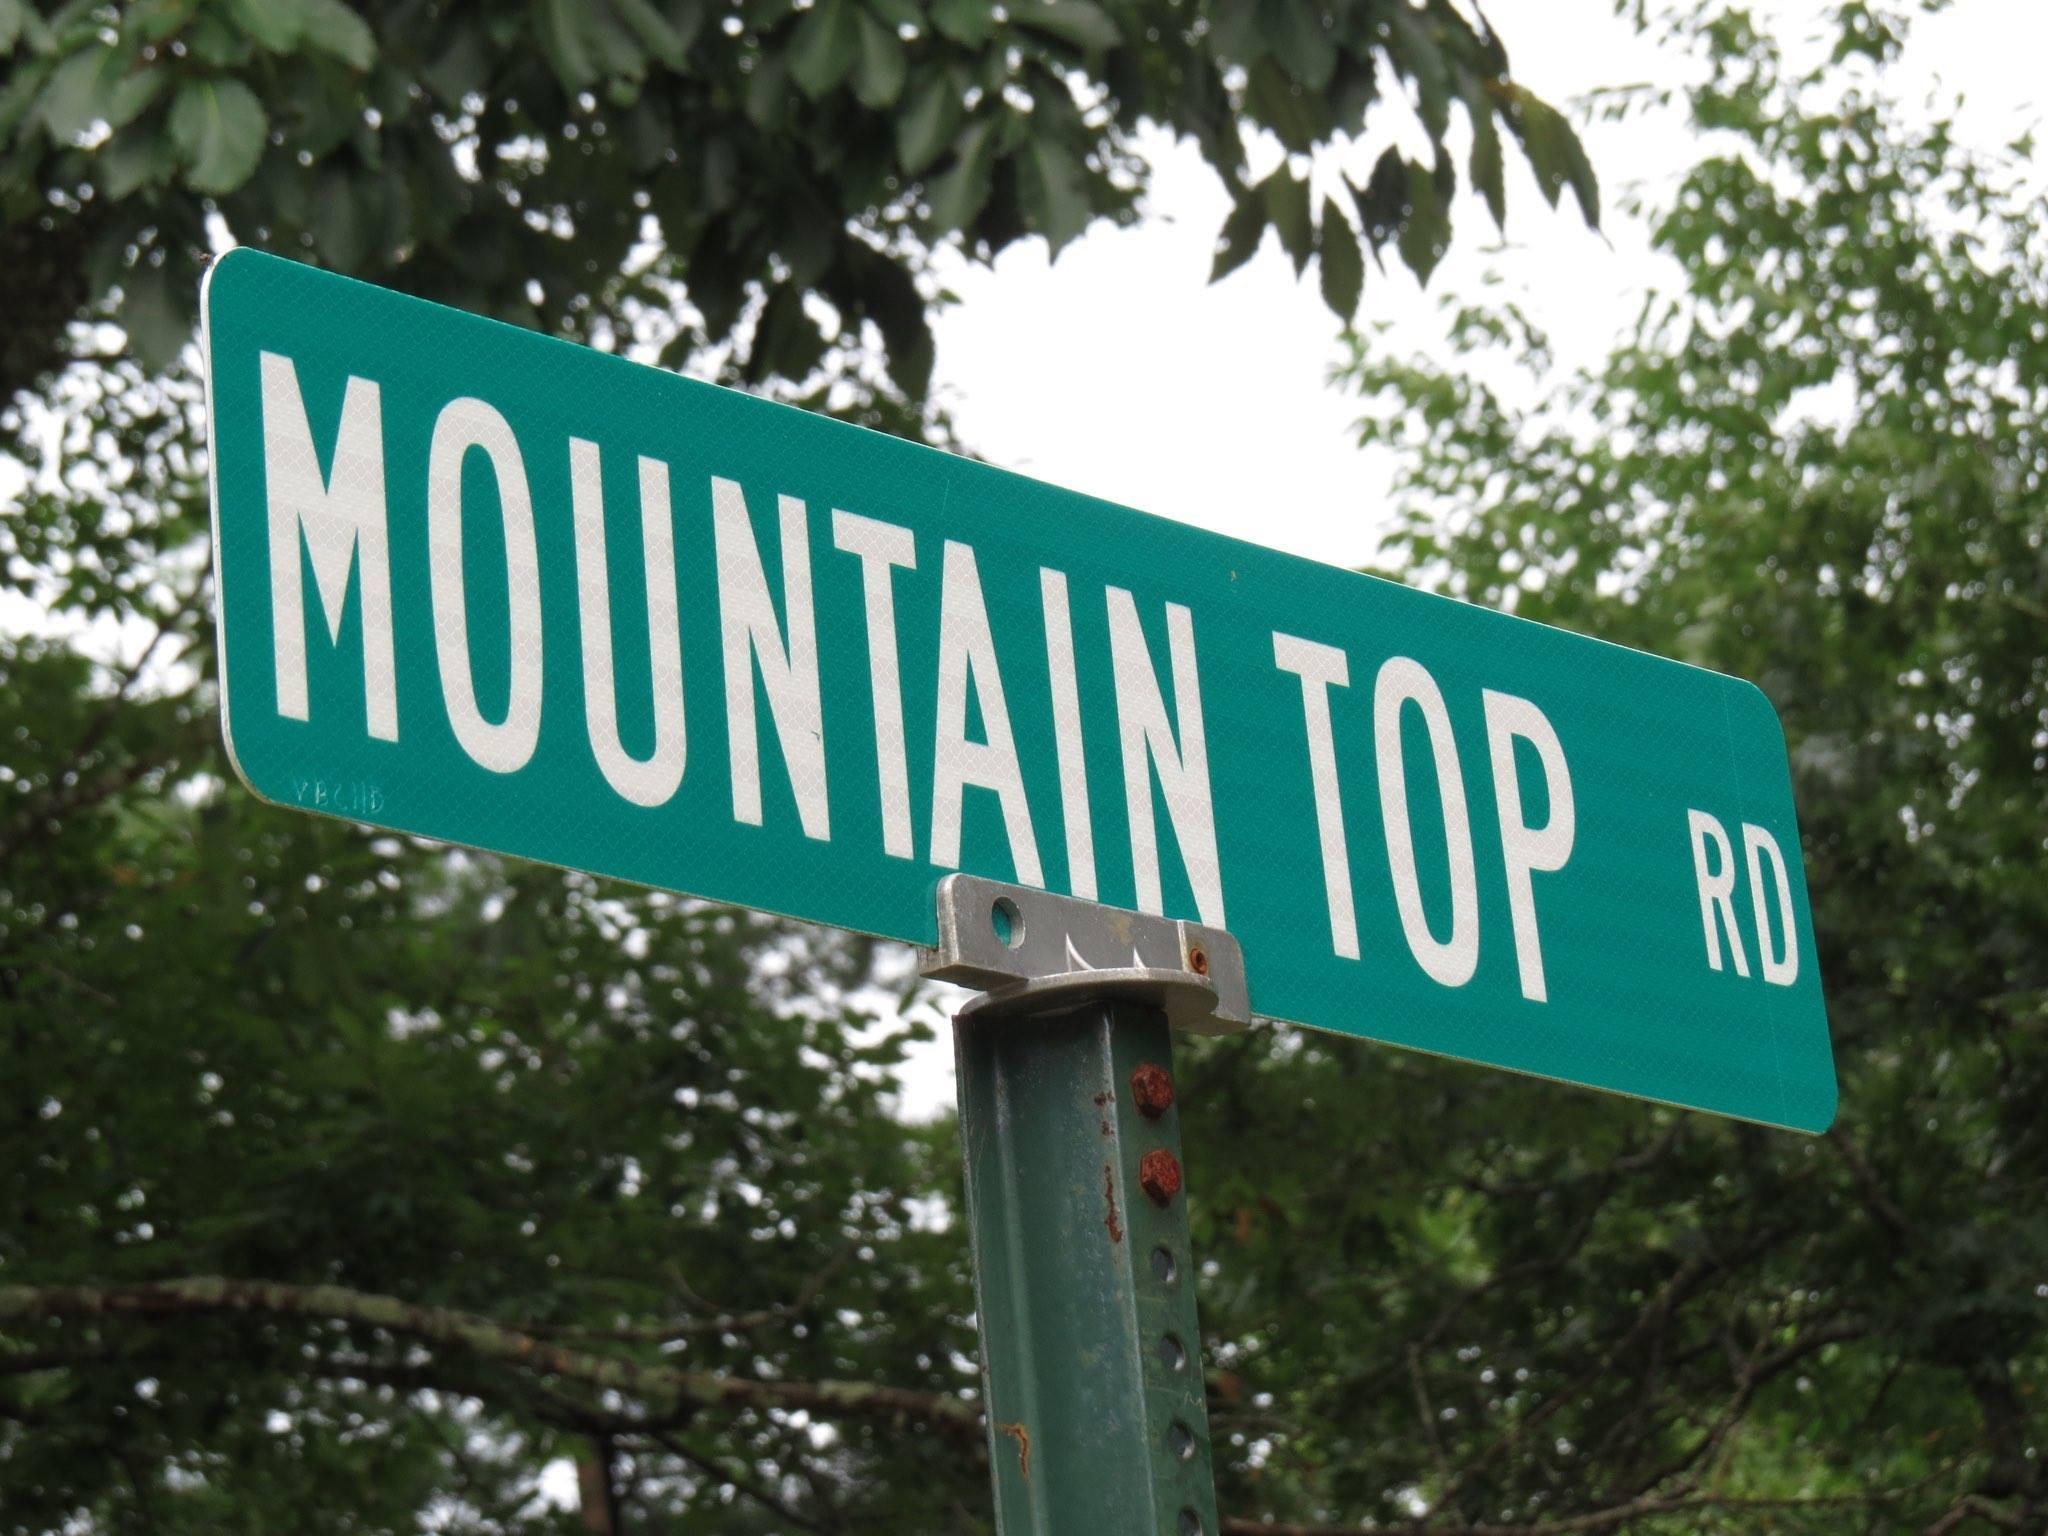 Mountain Top street sign